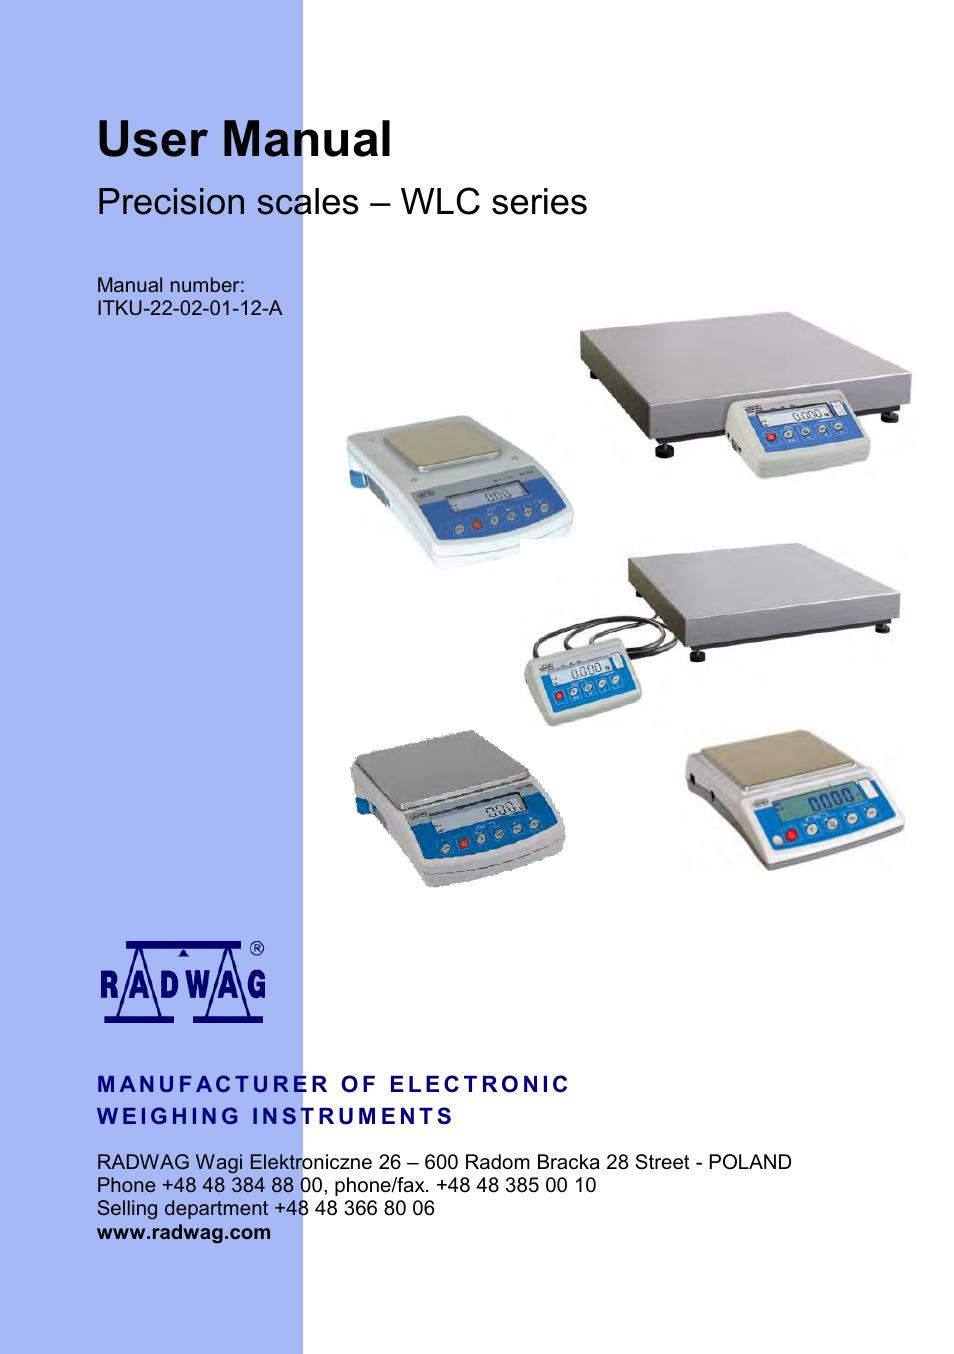 Radwag Wlc 0 6  A1  C  2 Precision Balance User Manual